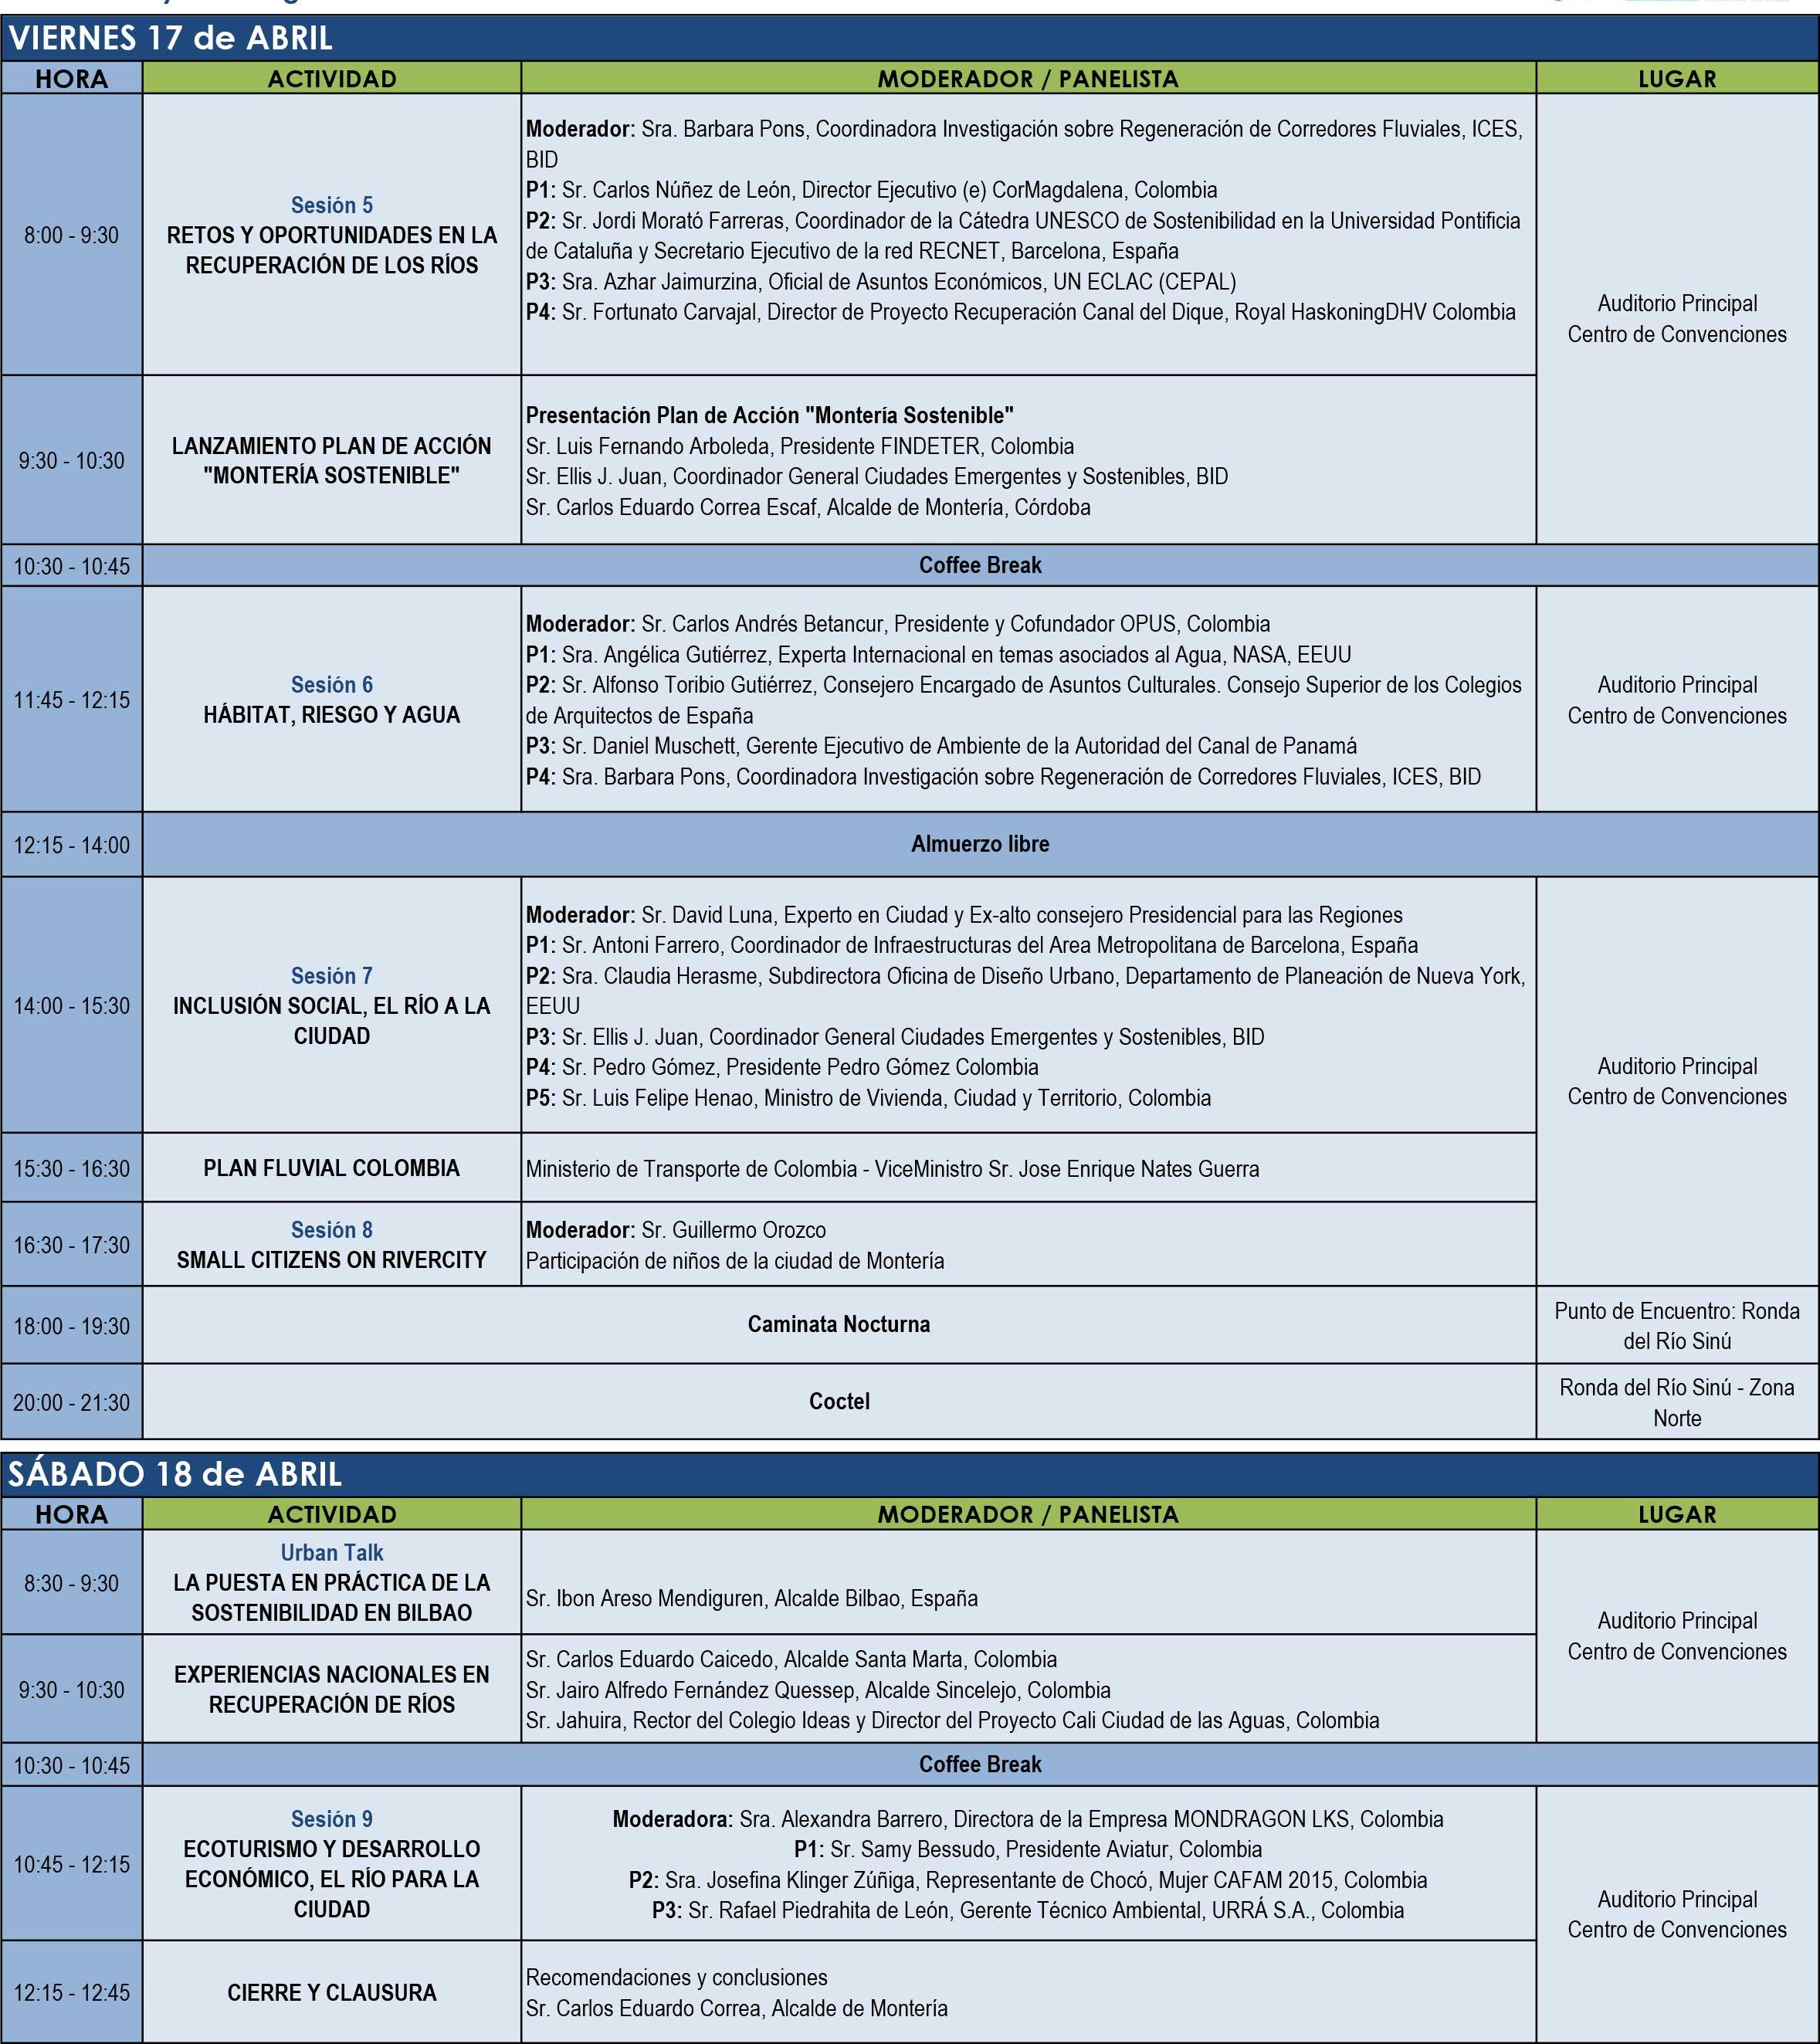 2actividades-river-city-forum-monteria-activities